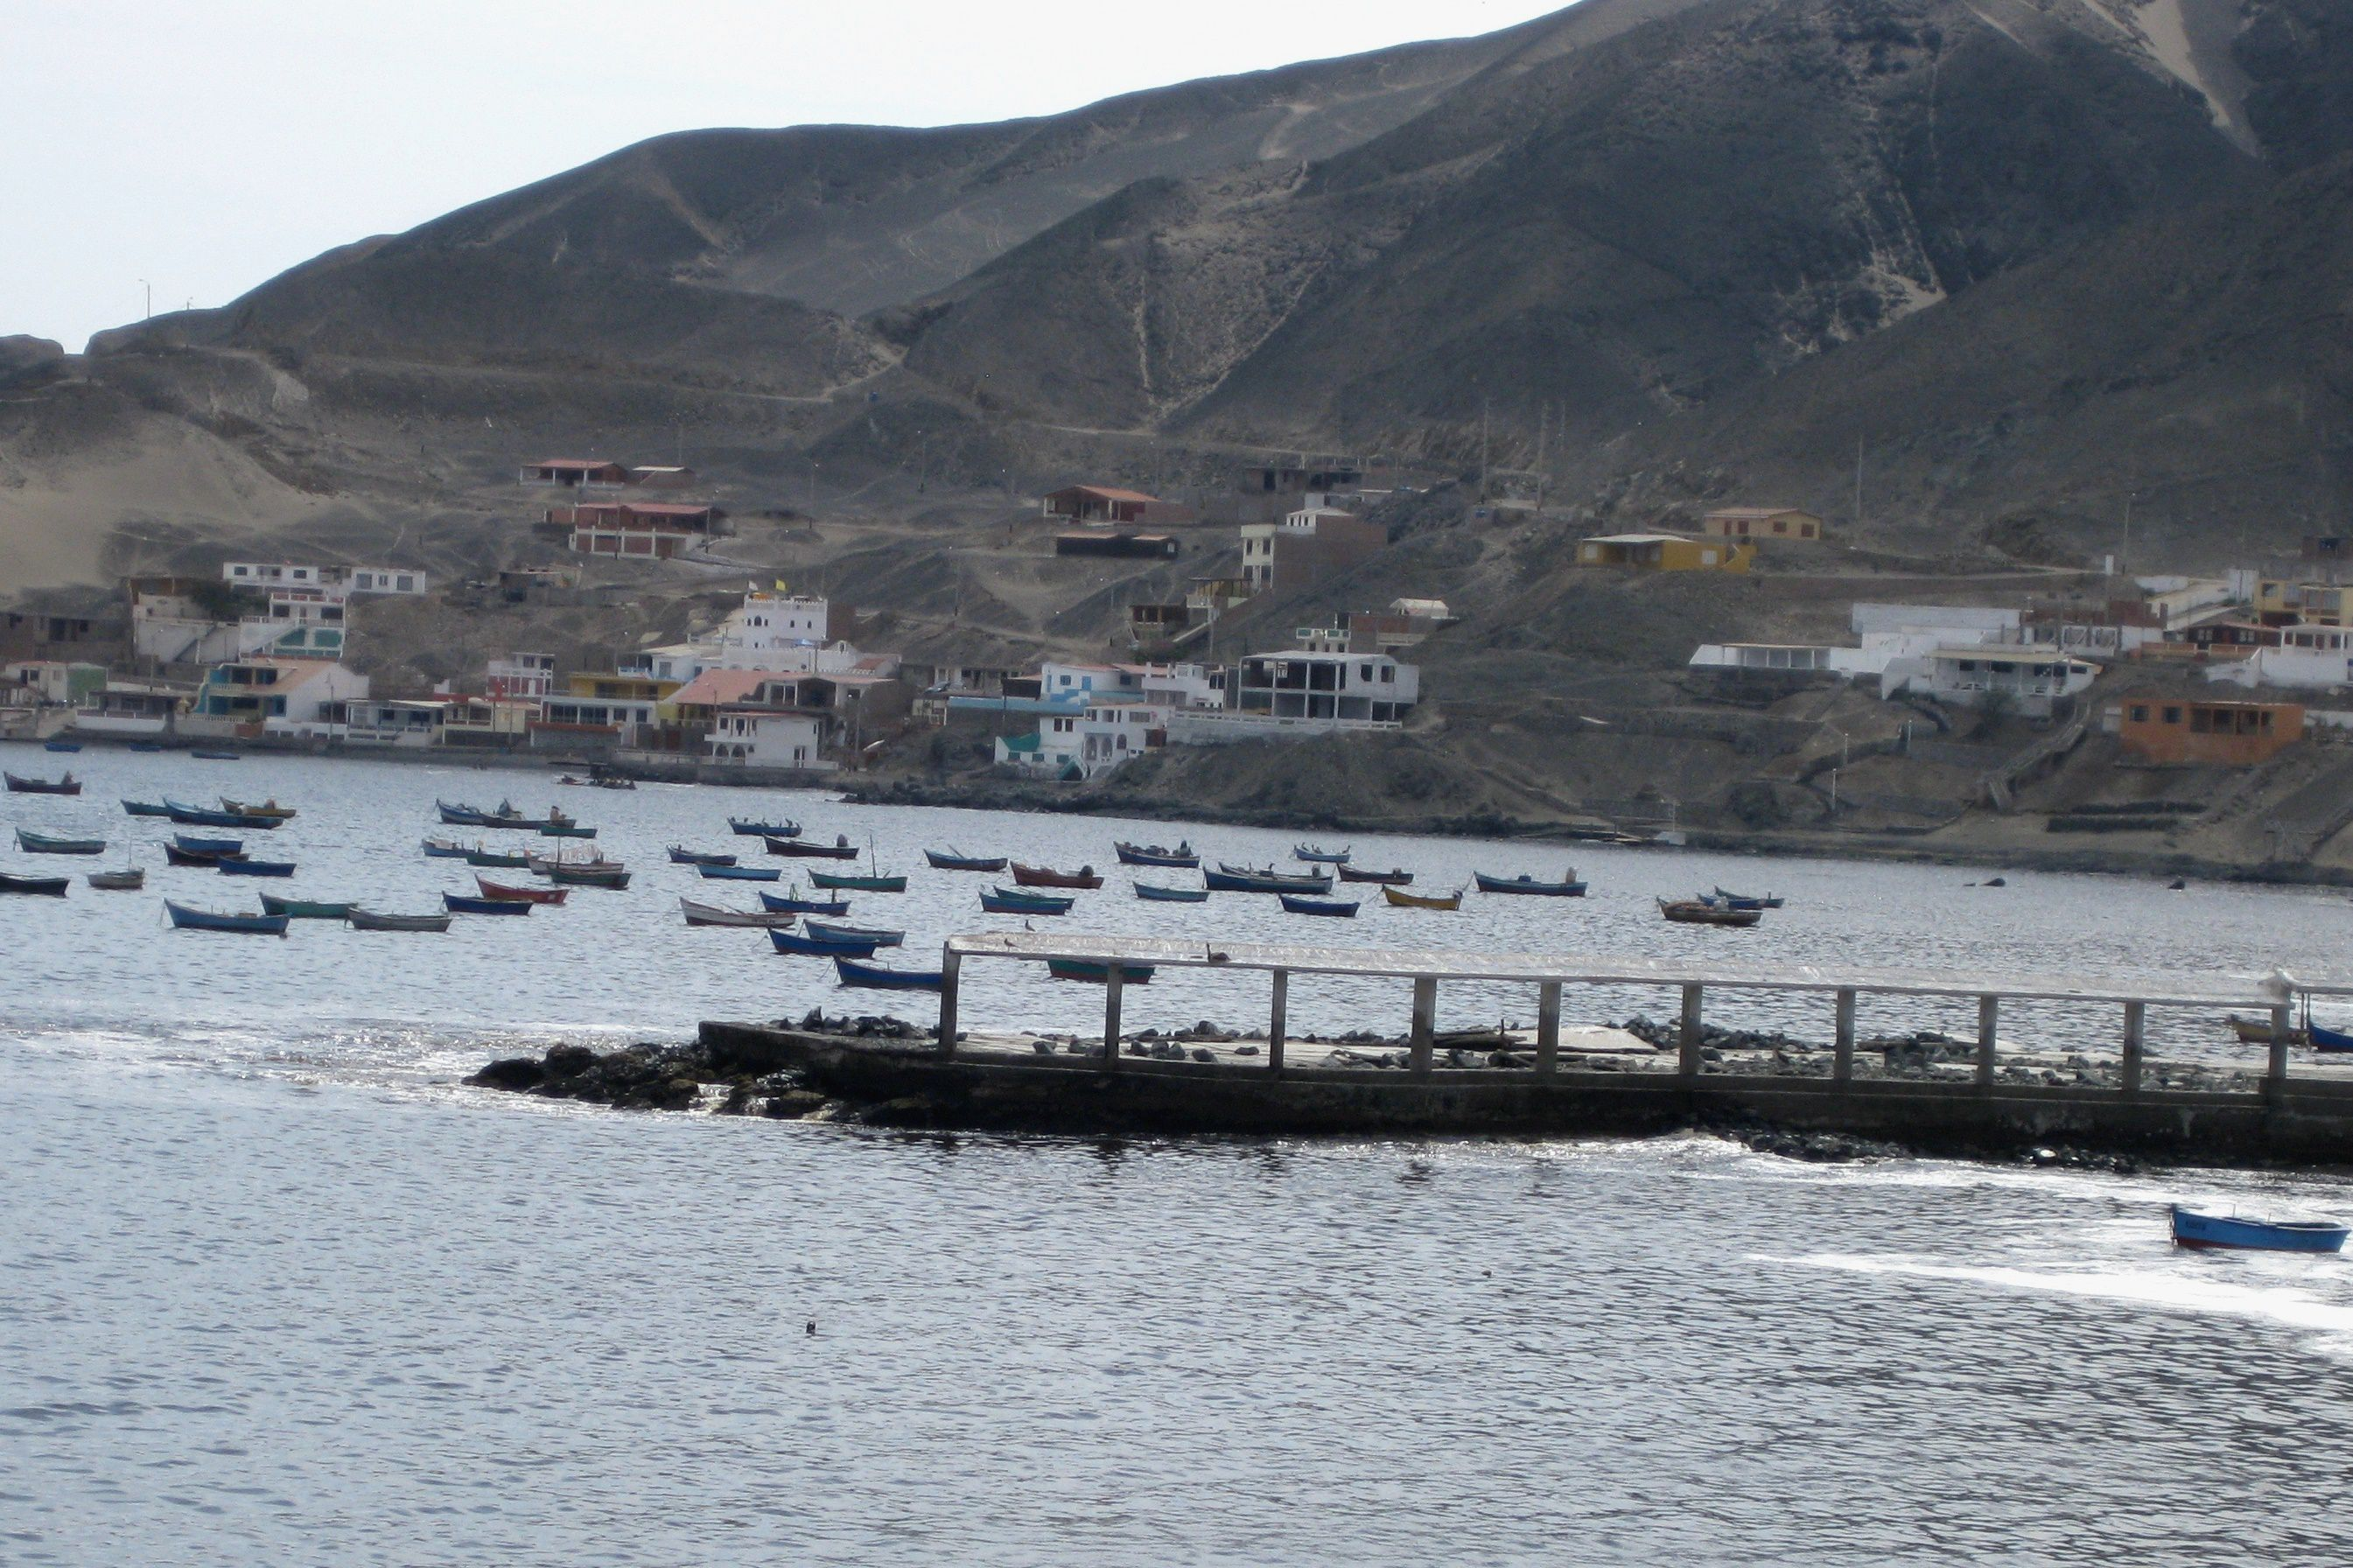 Playa Tortugas, Perú